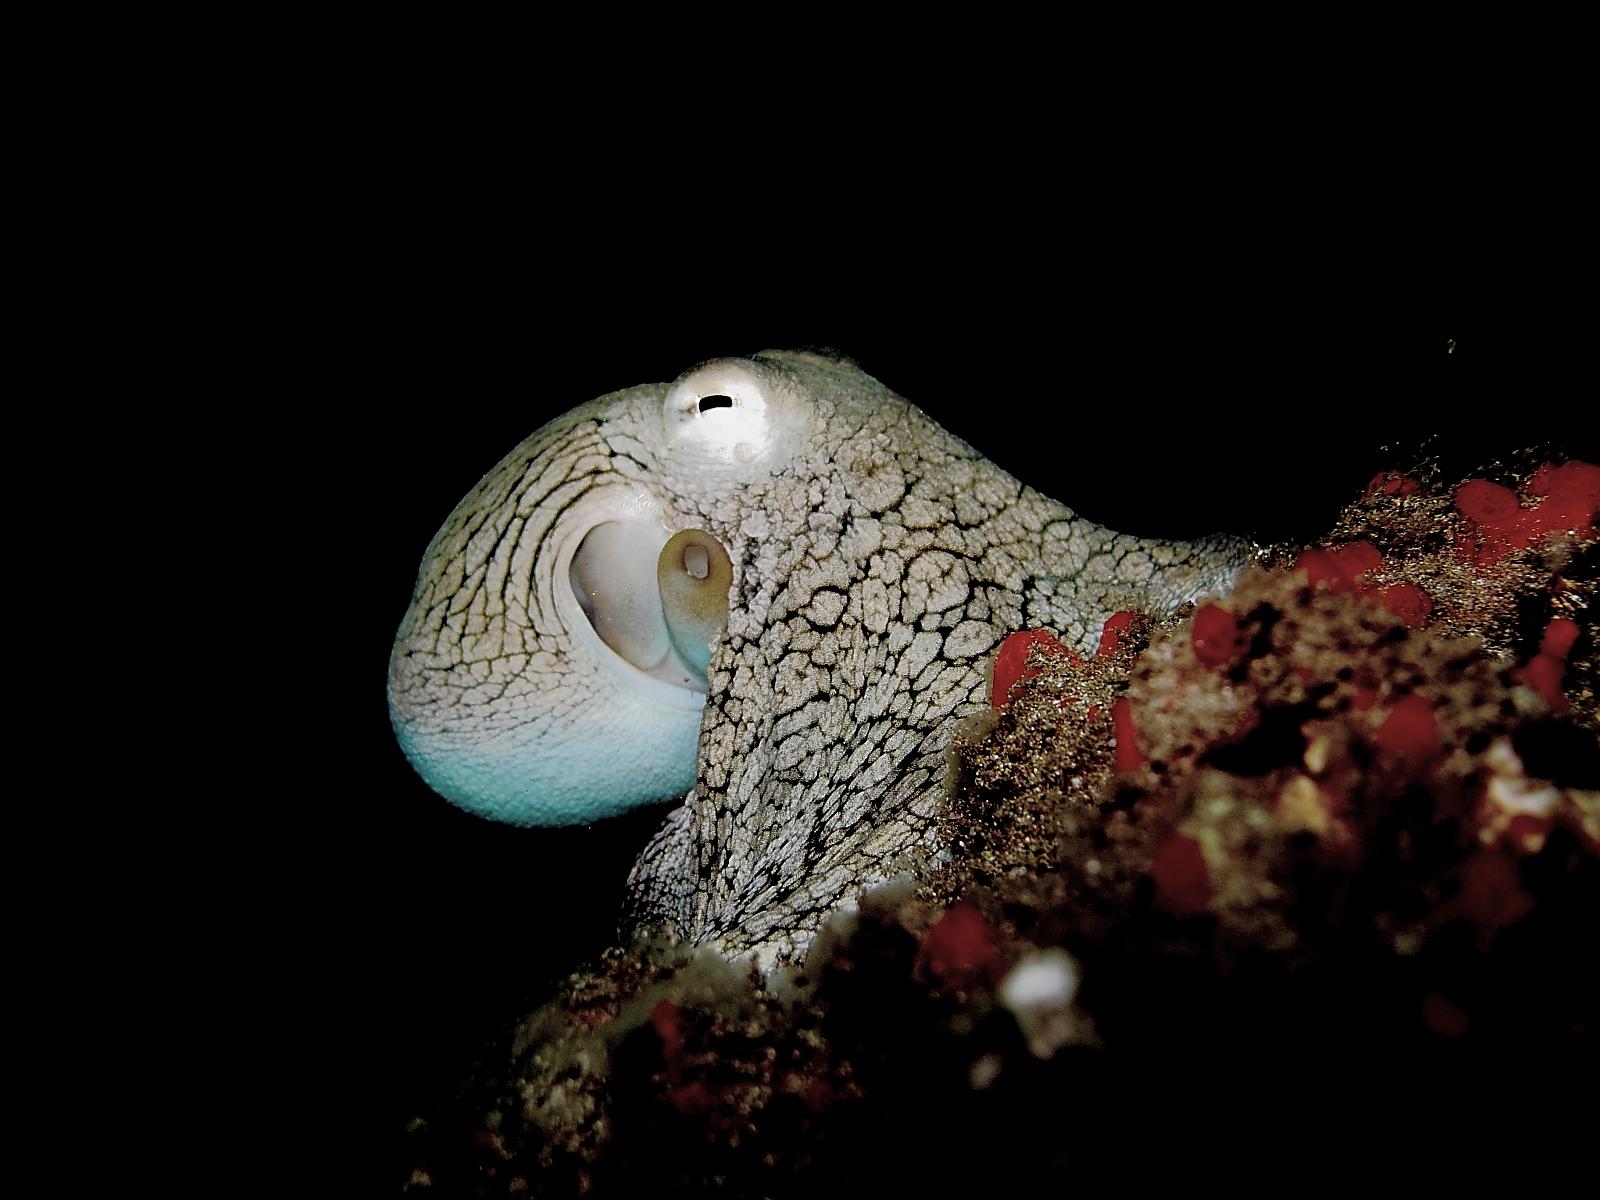 Capturing The Moment Strange Sea Creatures